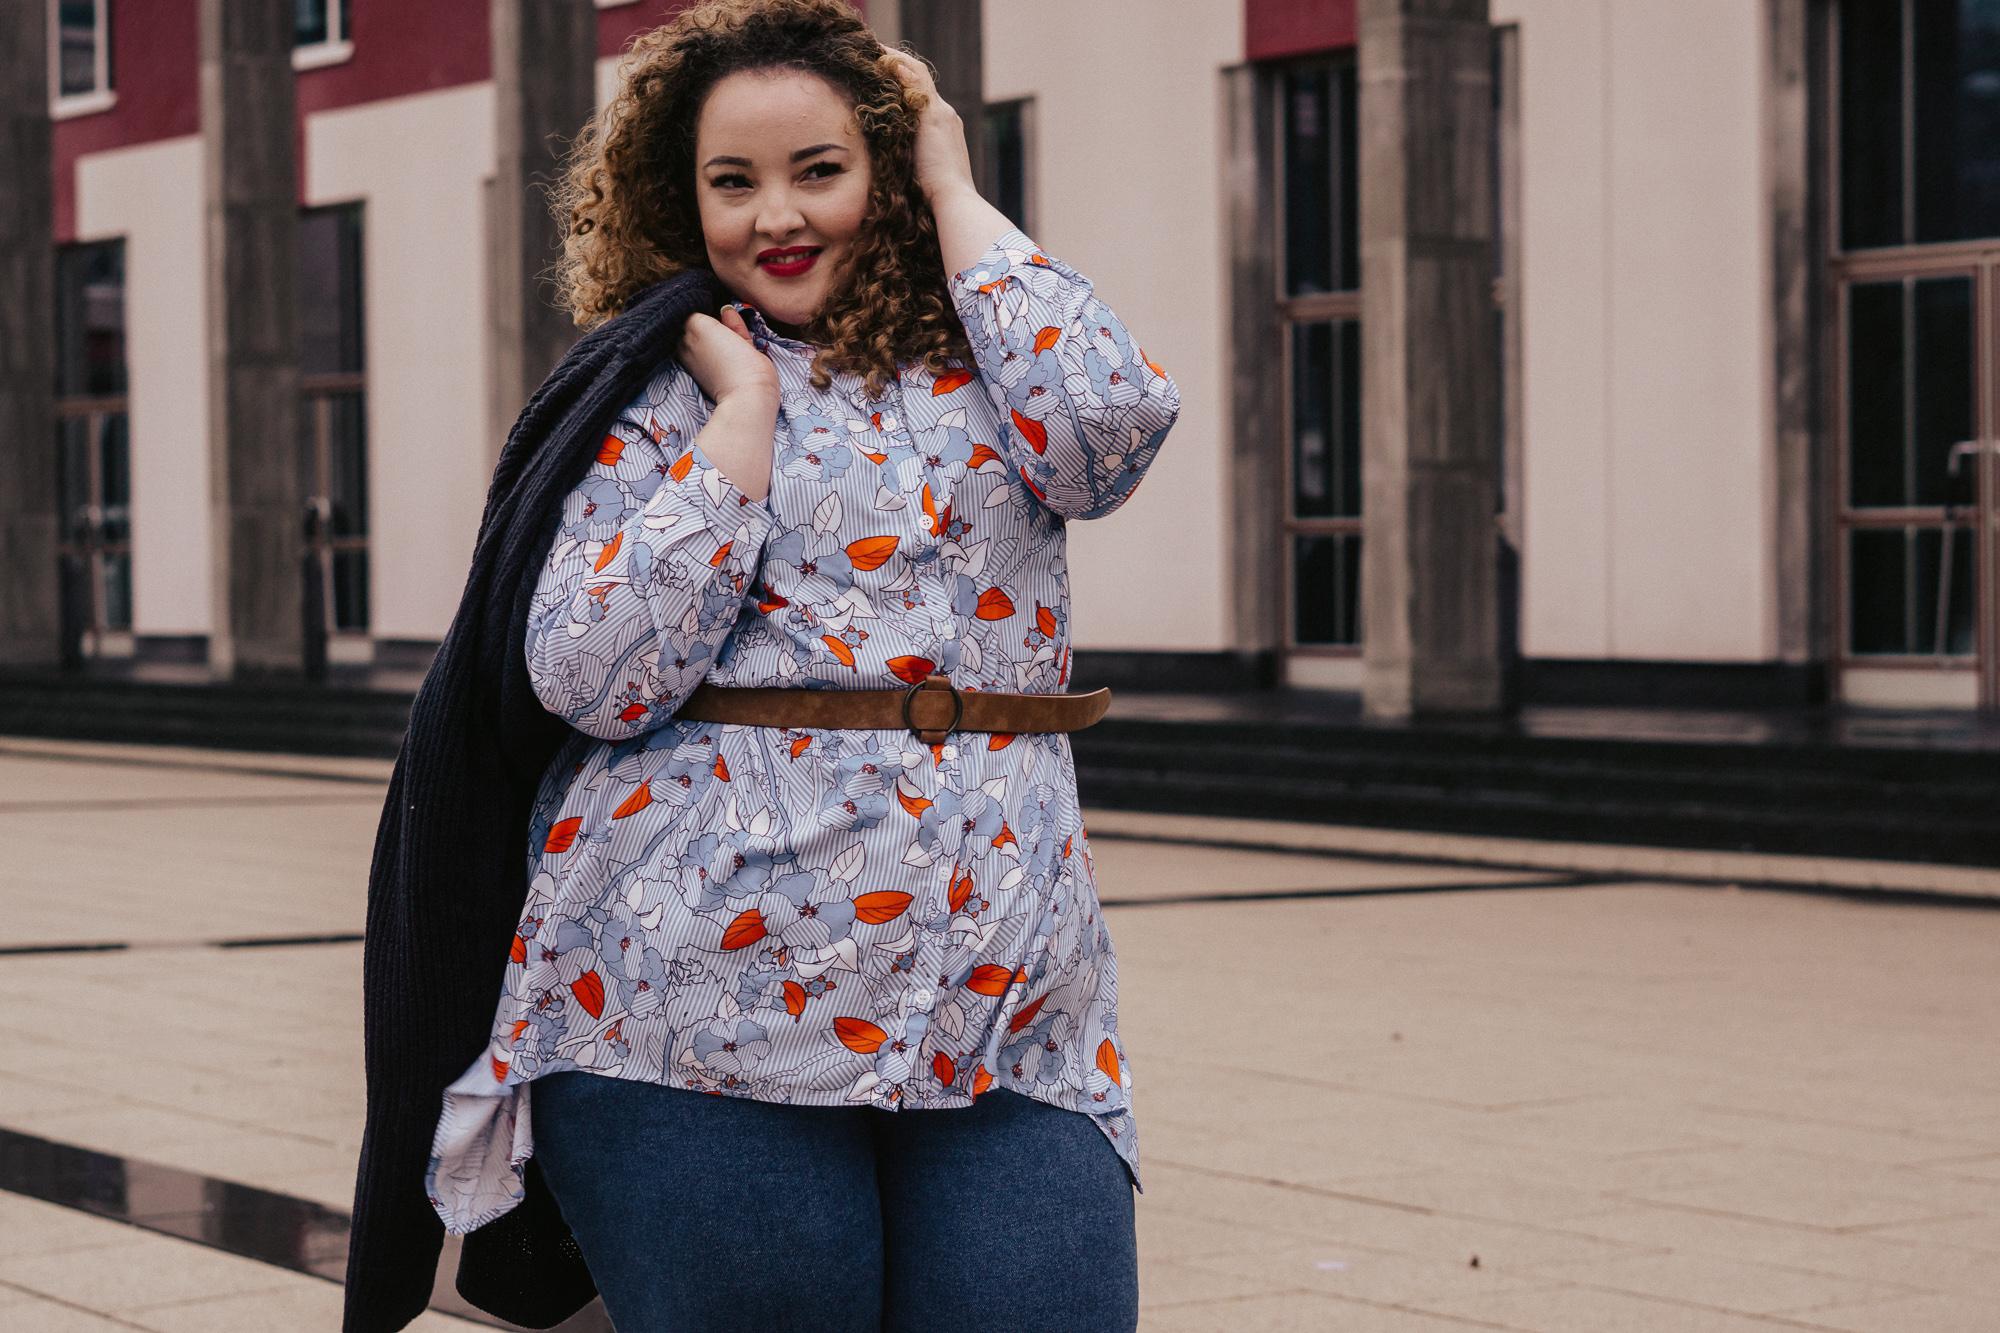 plus_size_blog_infatstyle_mia_outfit_2019_ulla_popken